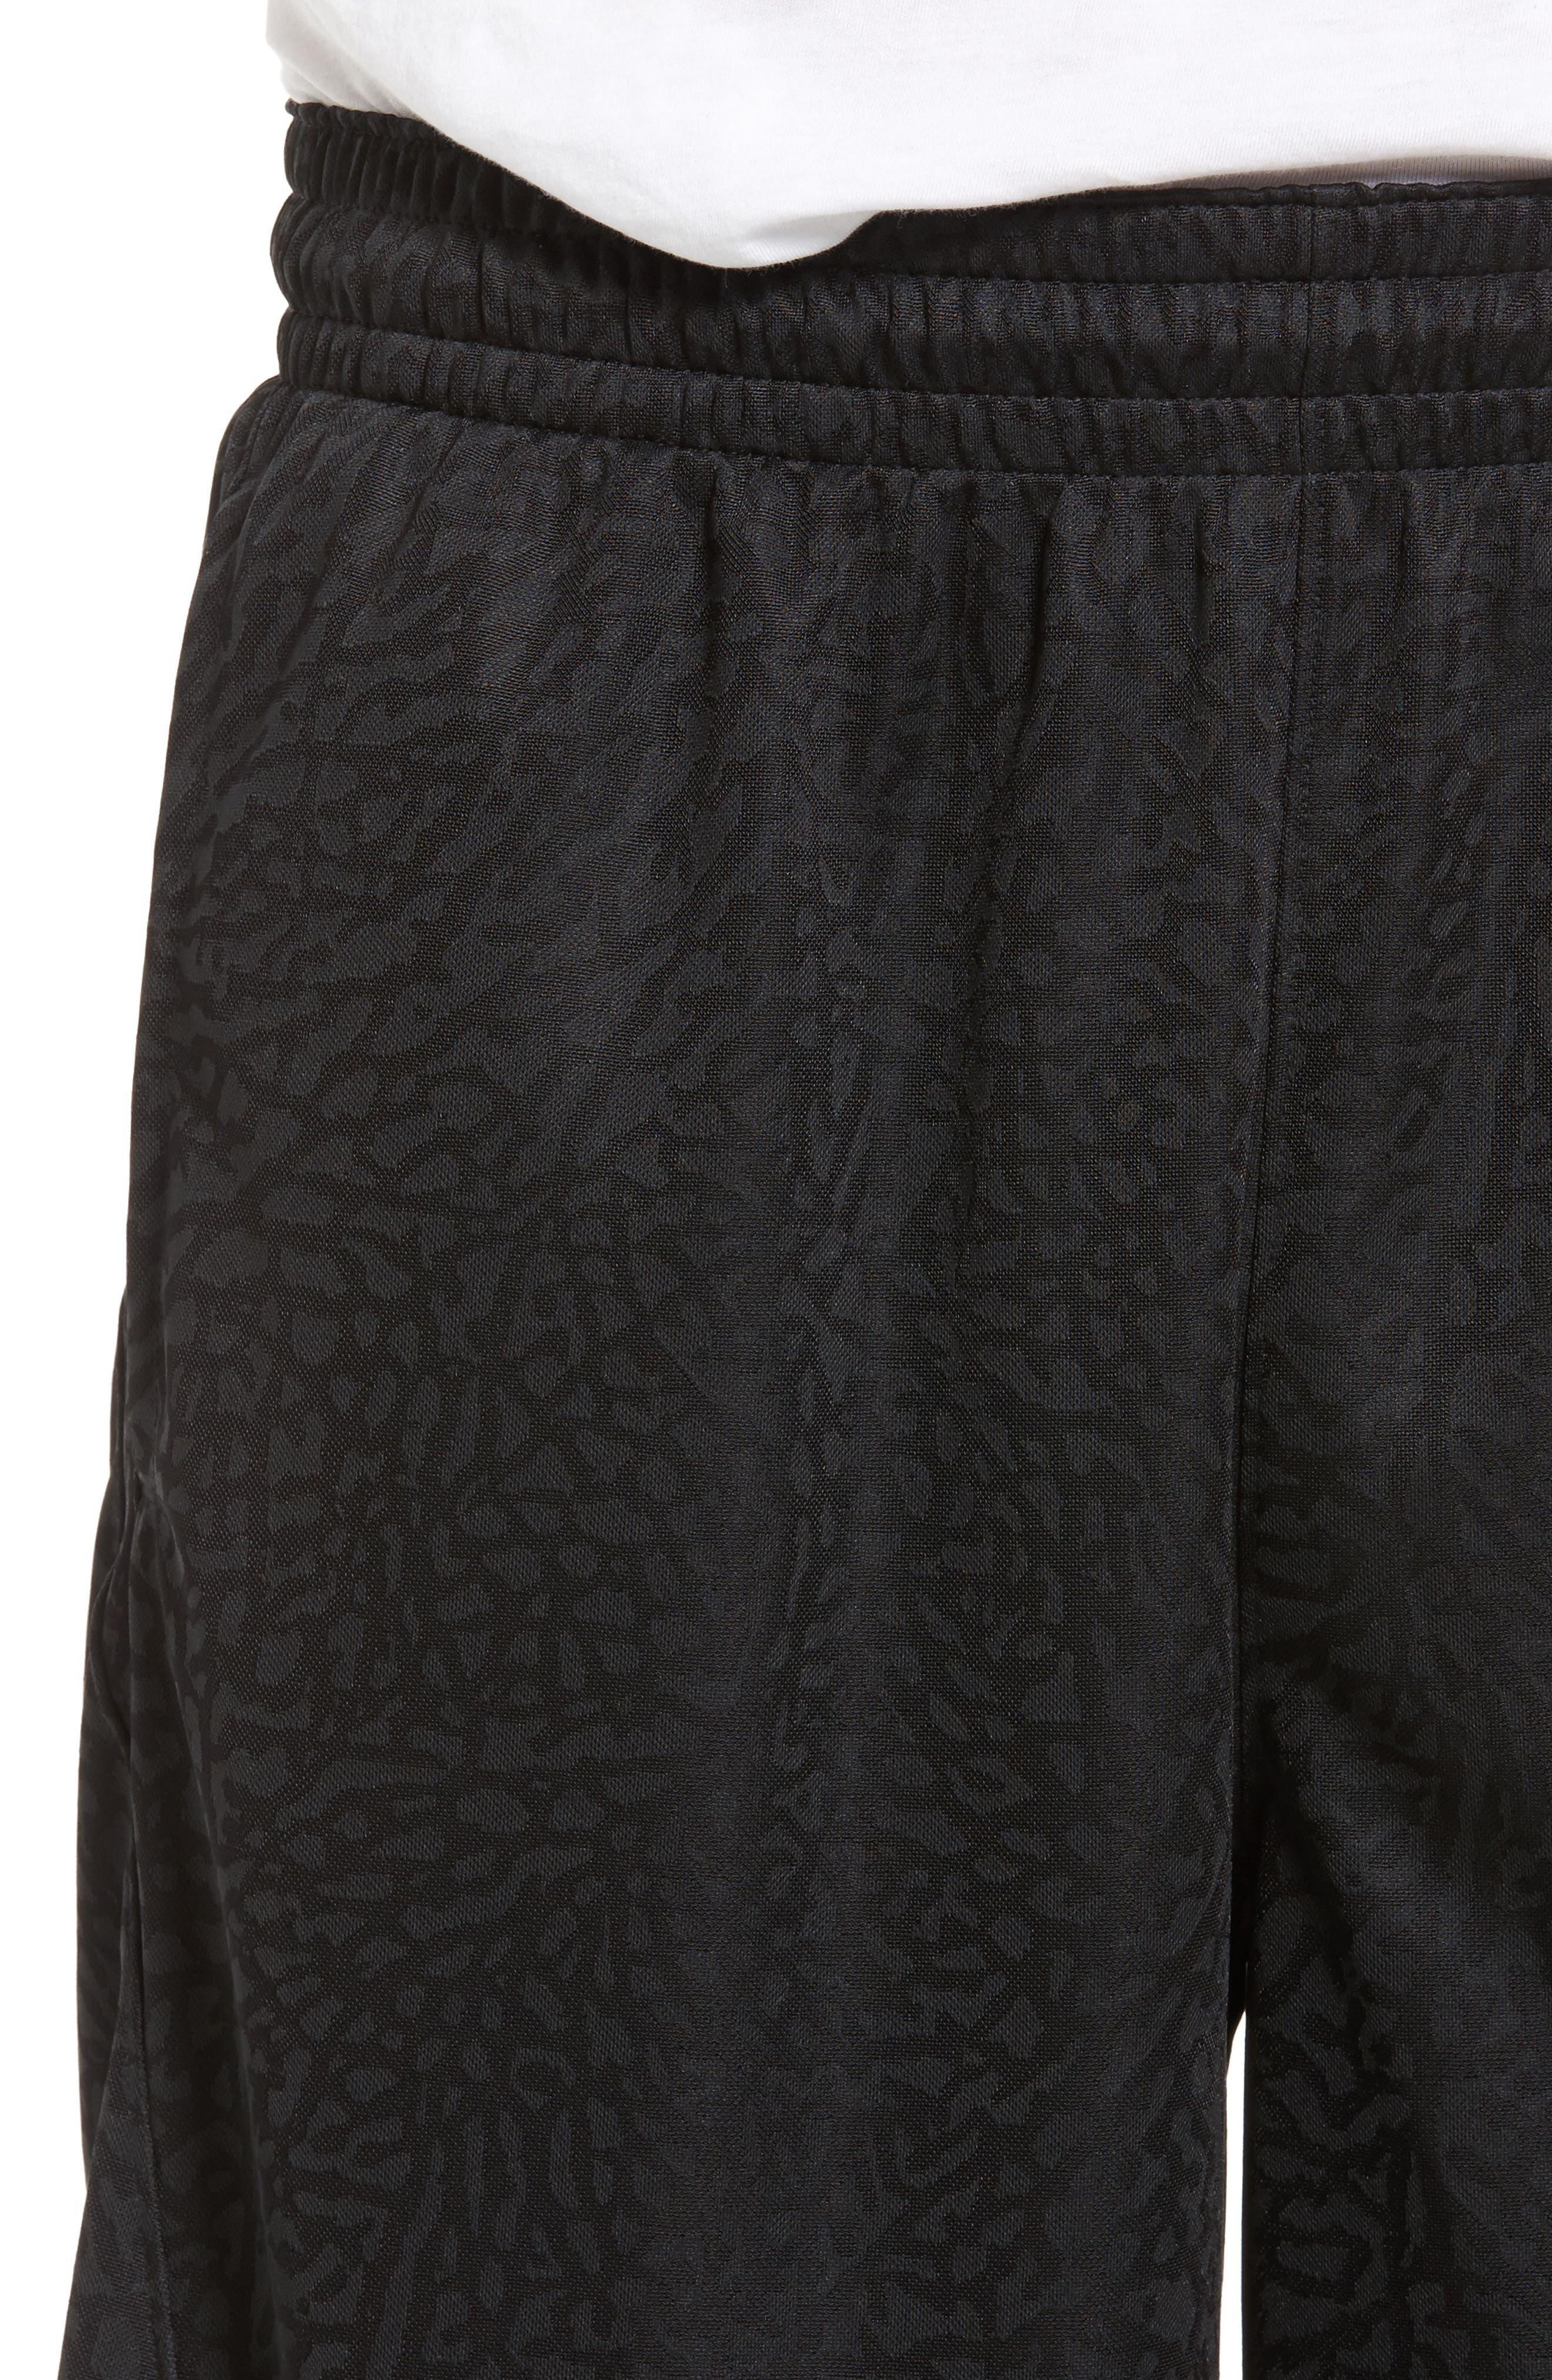 Rise Vertical Basketball Shorts,                             Alternate thumbnail 4, color,                             010